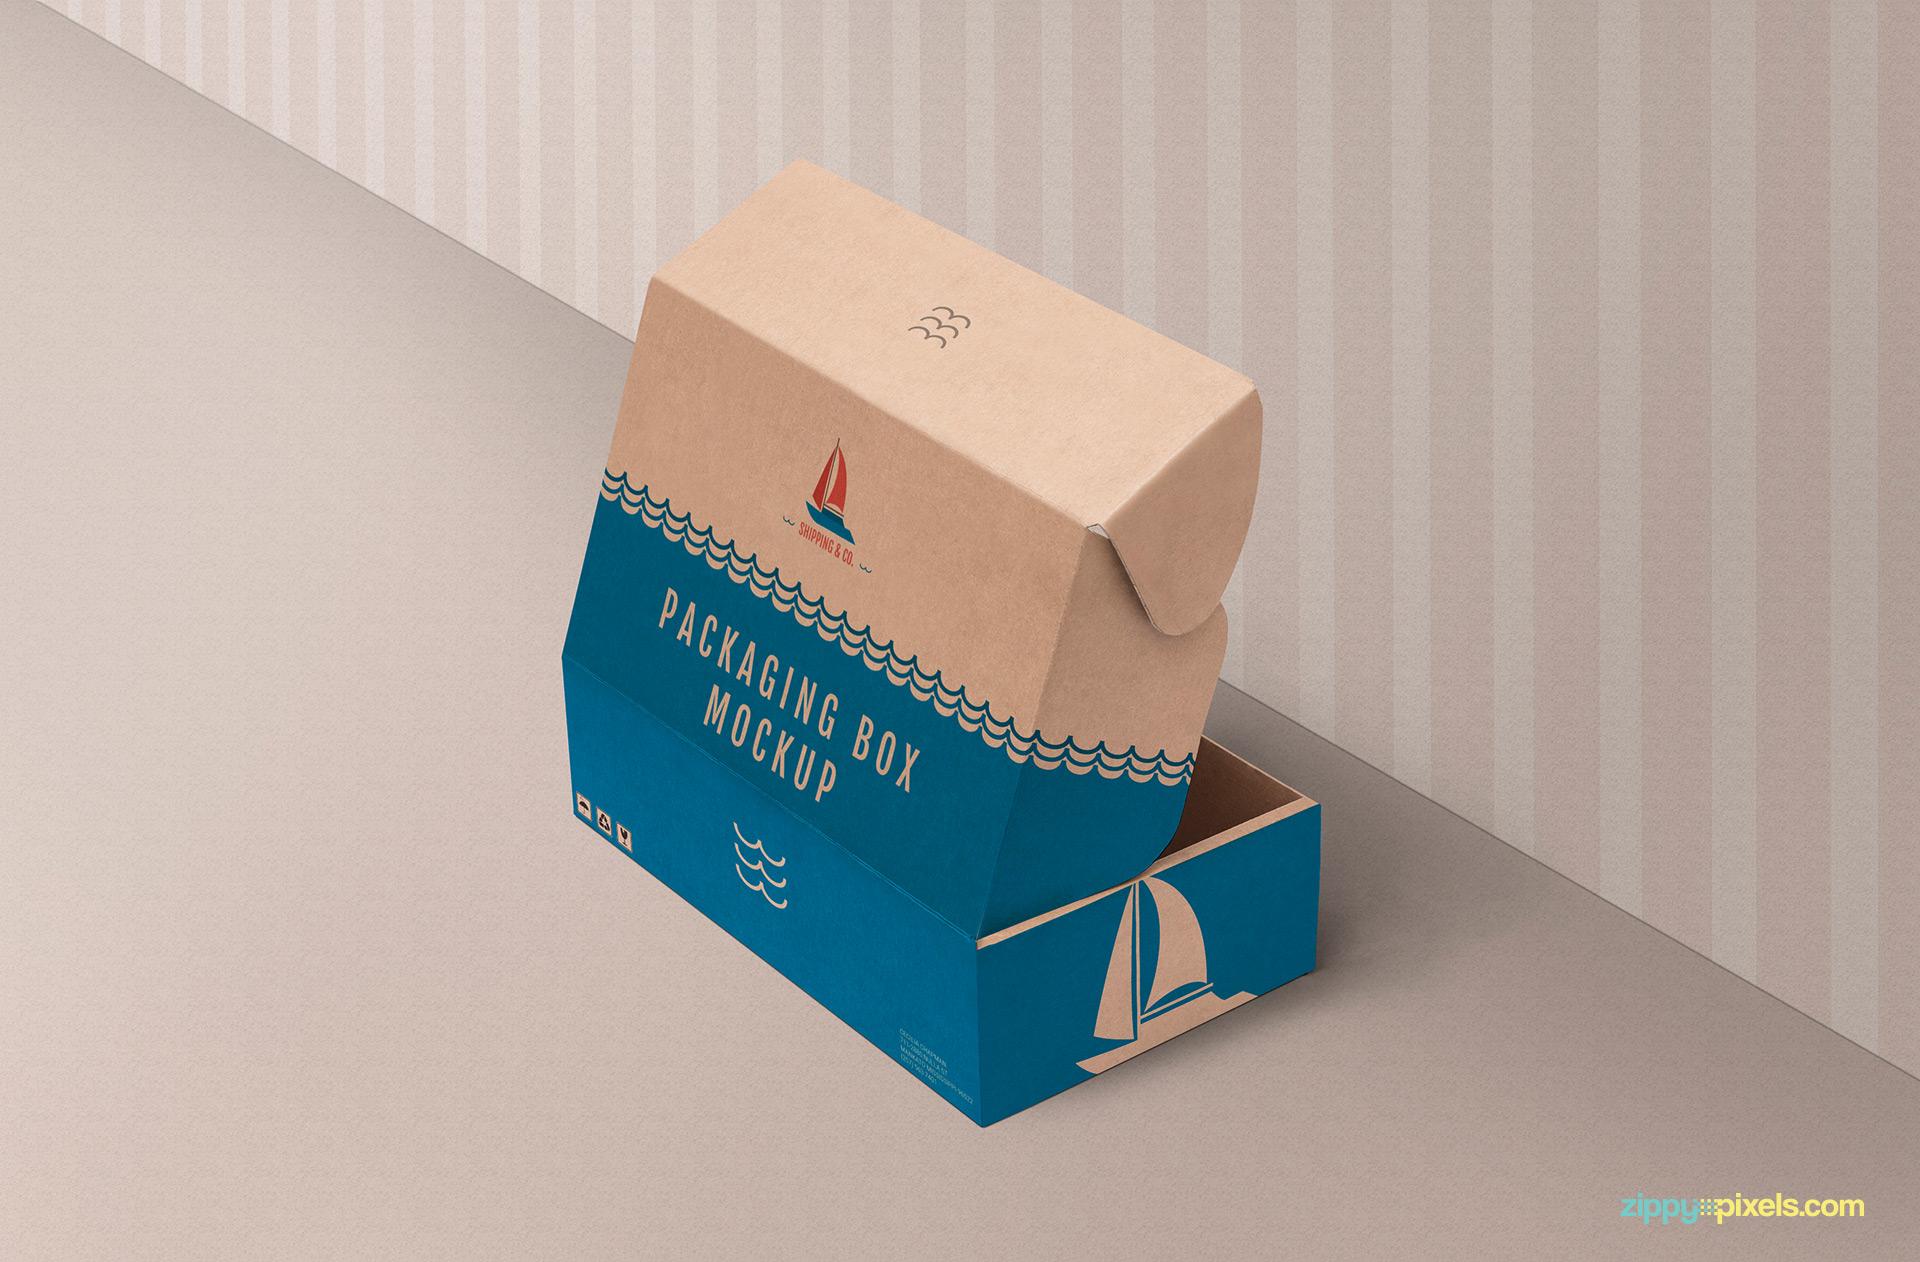 Free product box mockup.